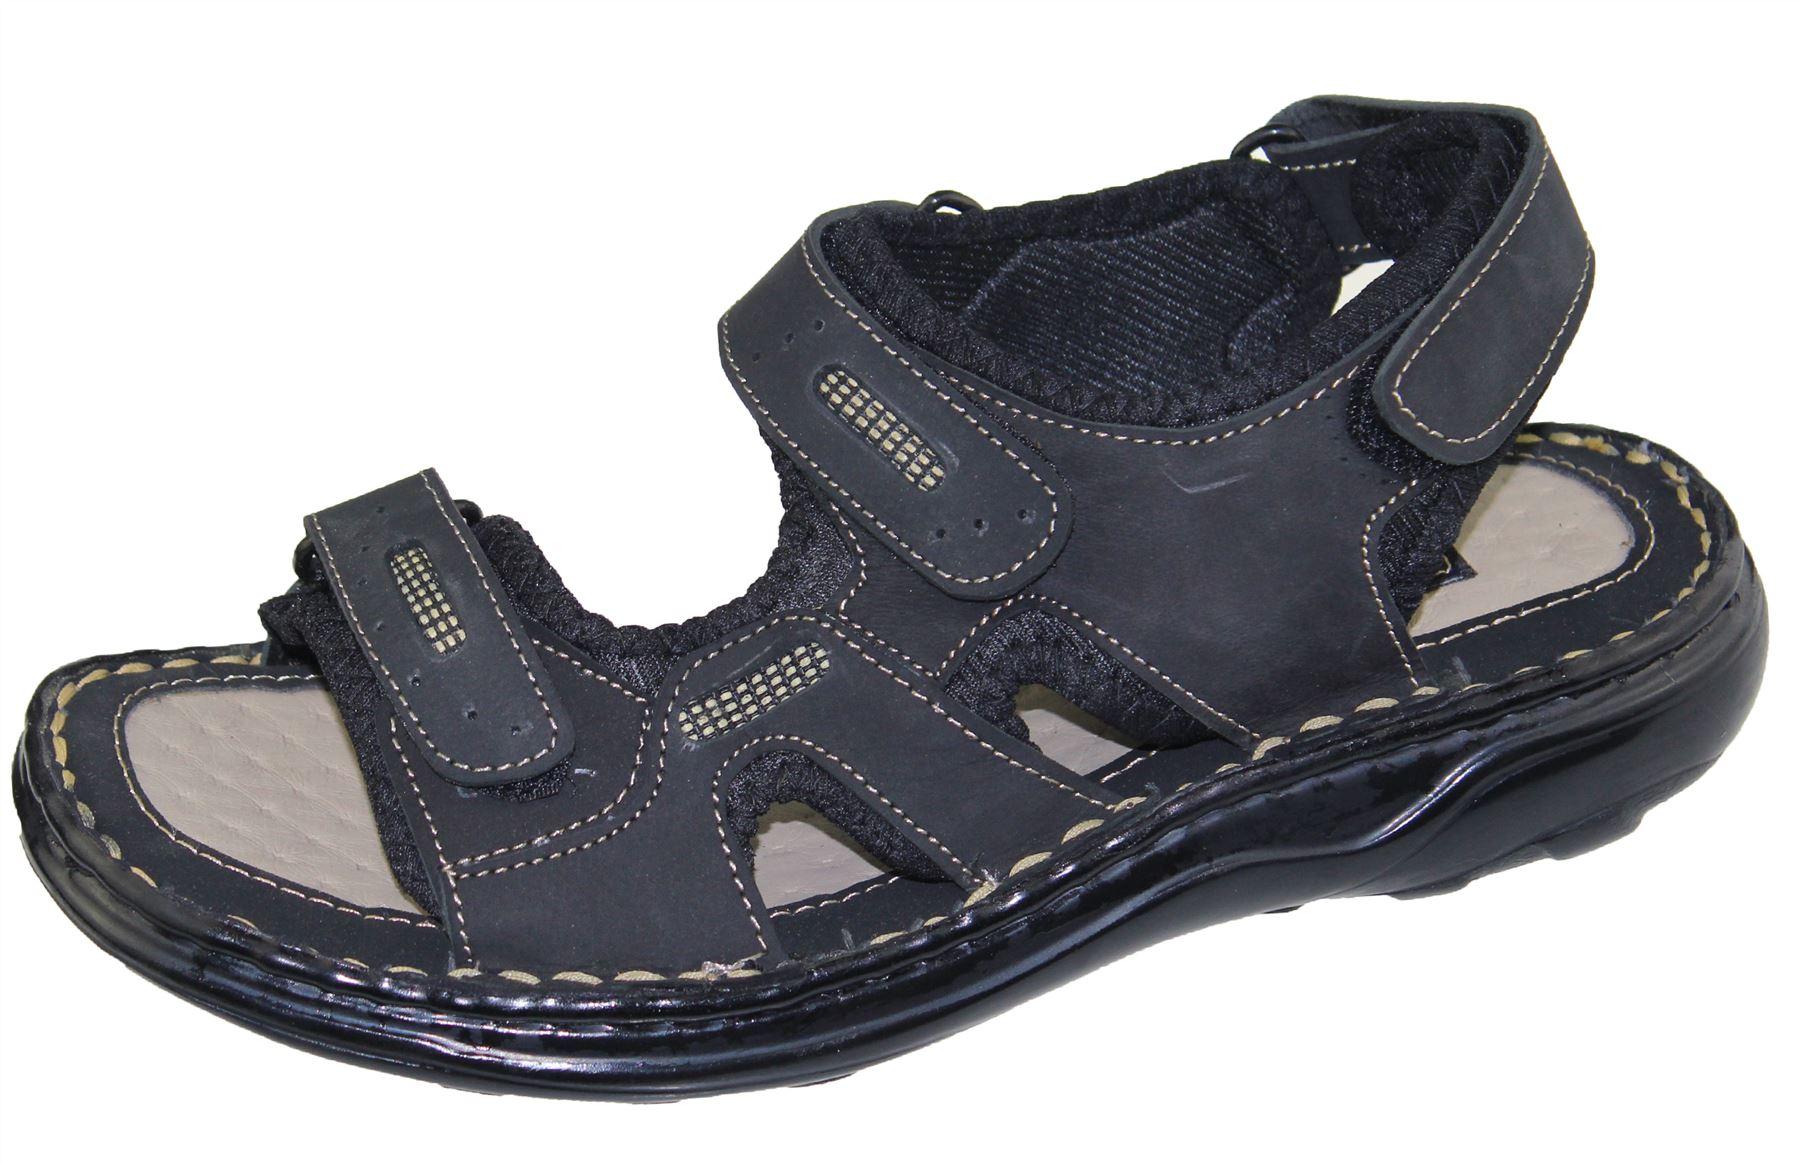 Mens Sports Beach Sandal Buckle Walking Fashion Summer ...